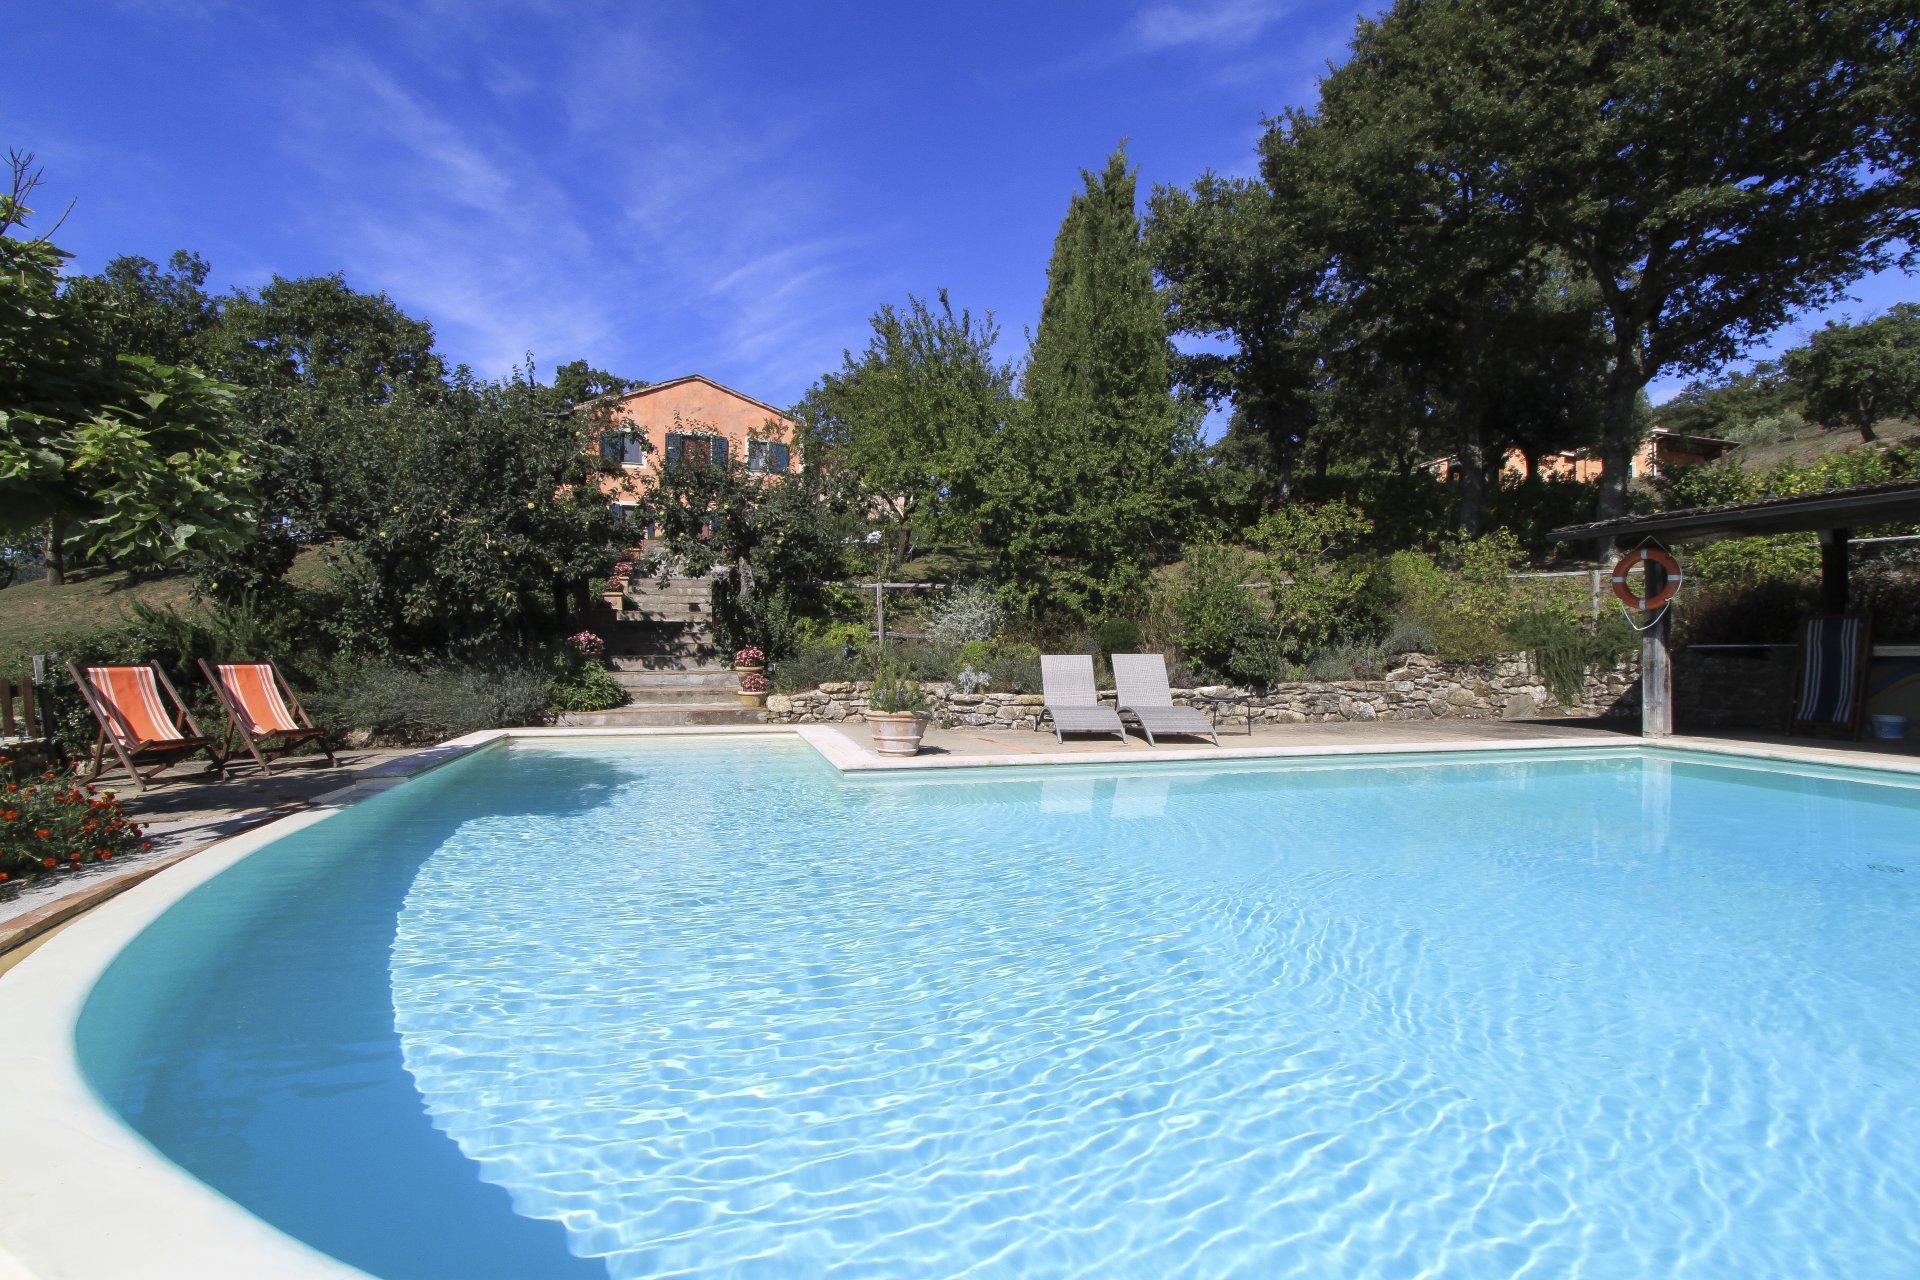 Italy Tuscany Siena Acquachiara pool